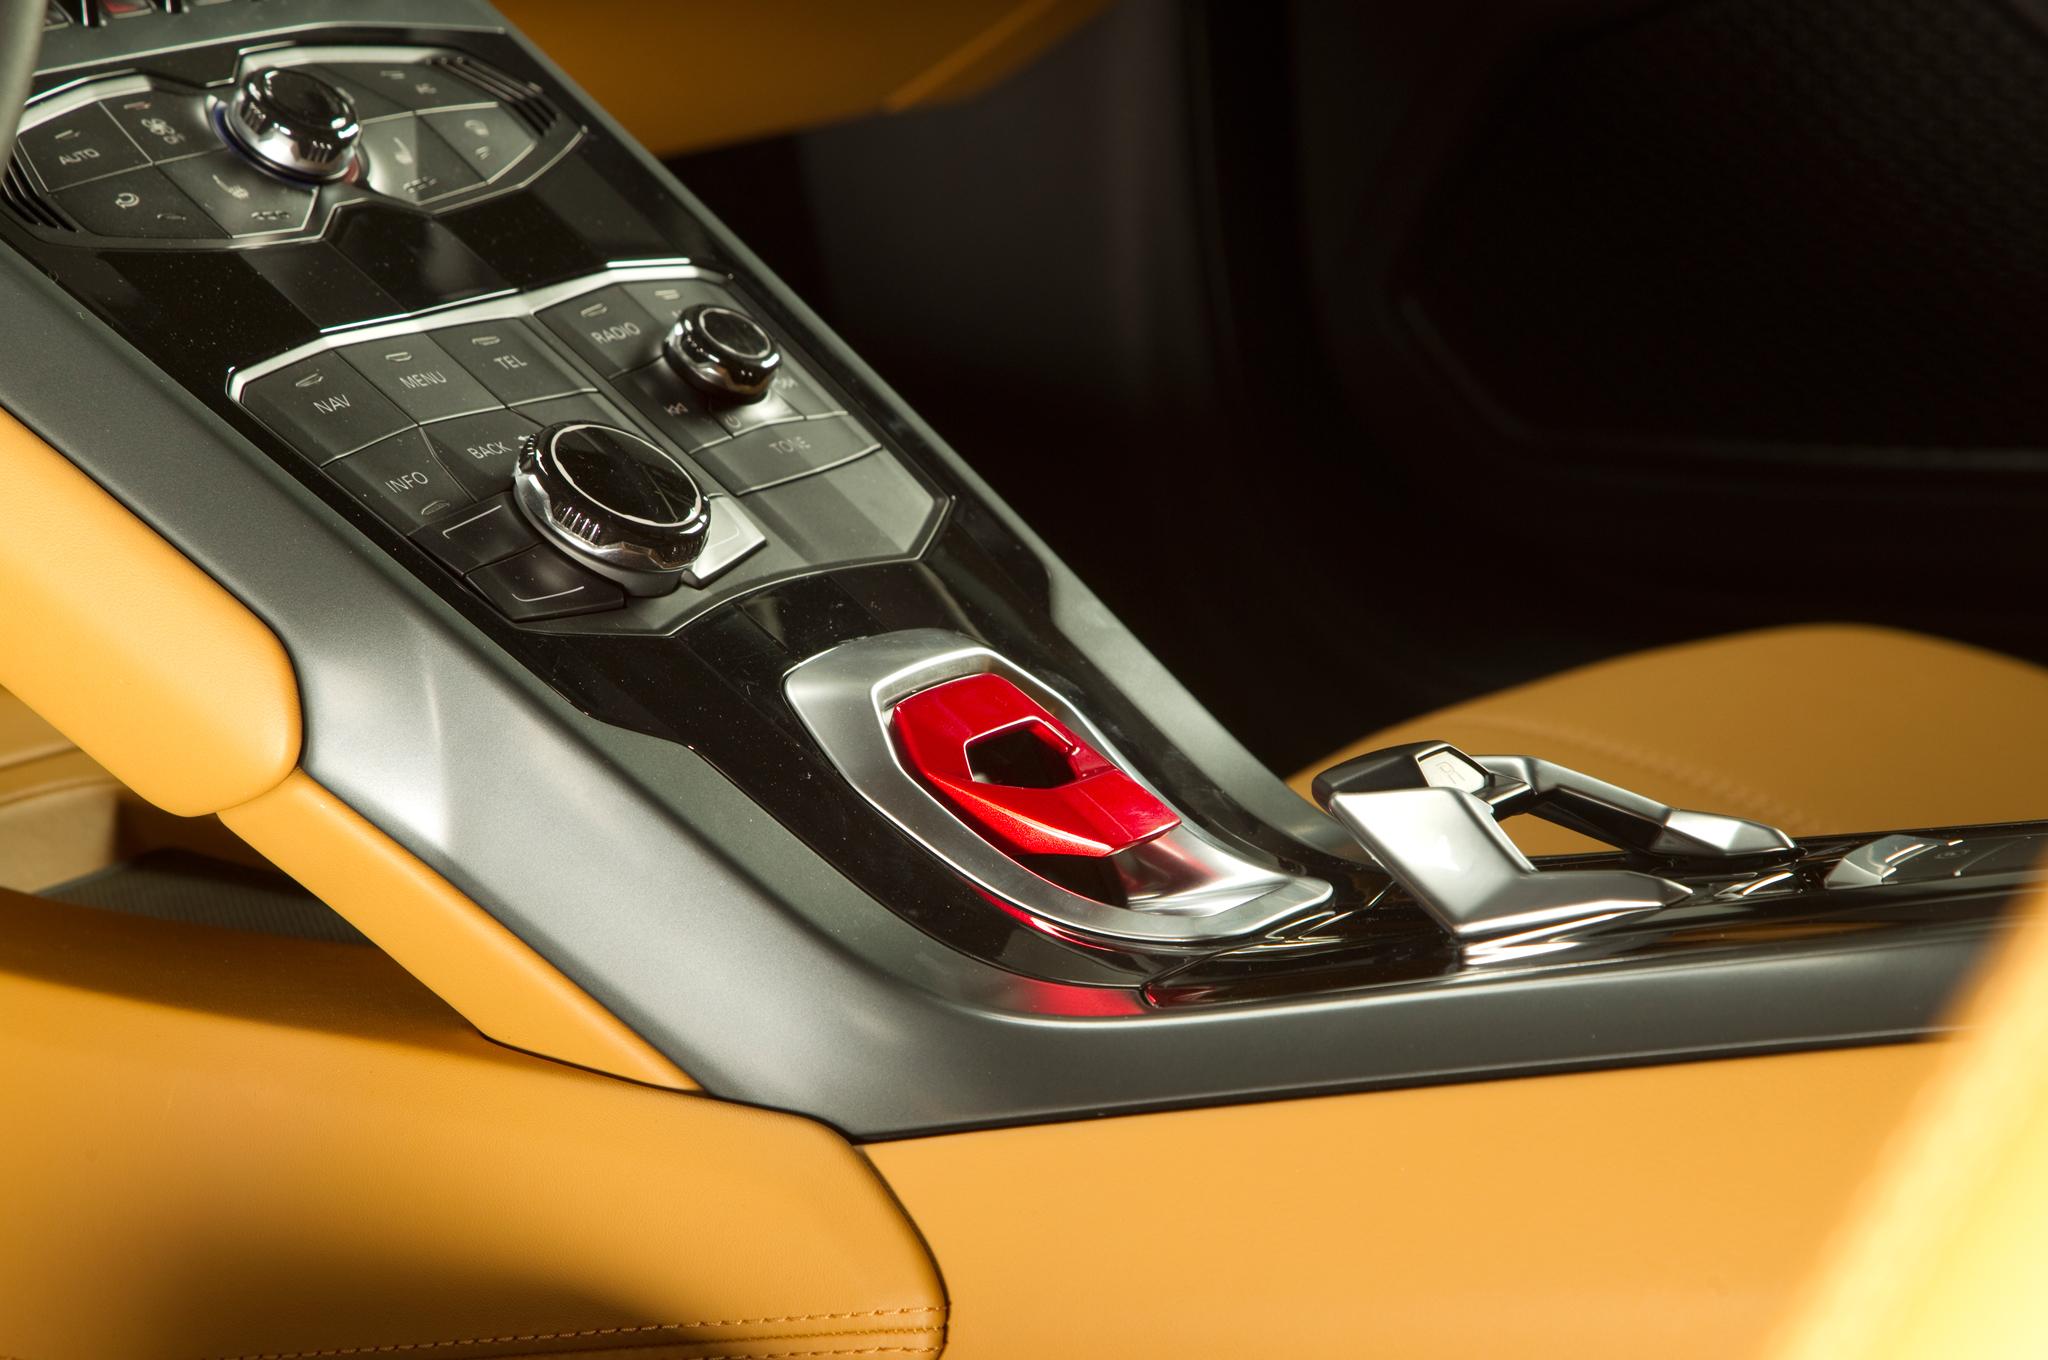 http—image.motortrend.com-f-roadtests-exotic-1312_2015_lamborghini_huracan_first_look-59411600-2015-Lamborghini-Huracan-center-console-04